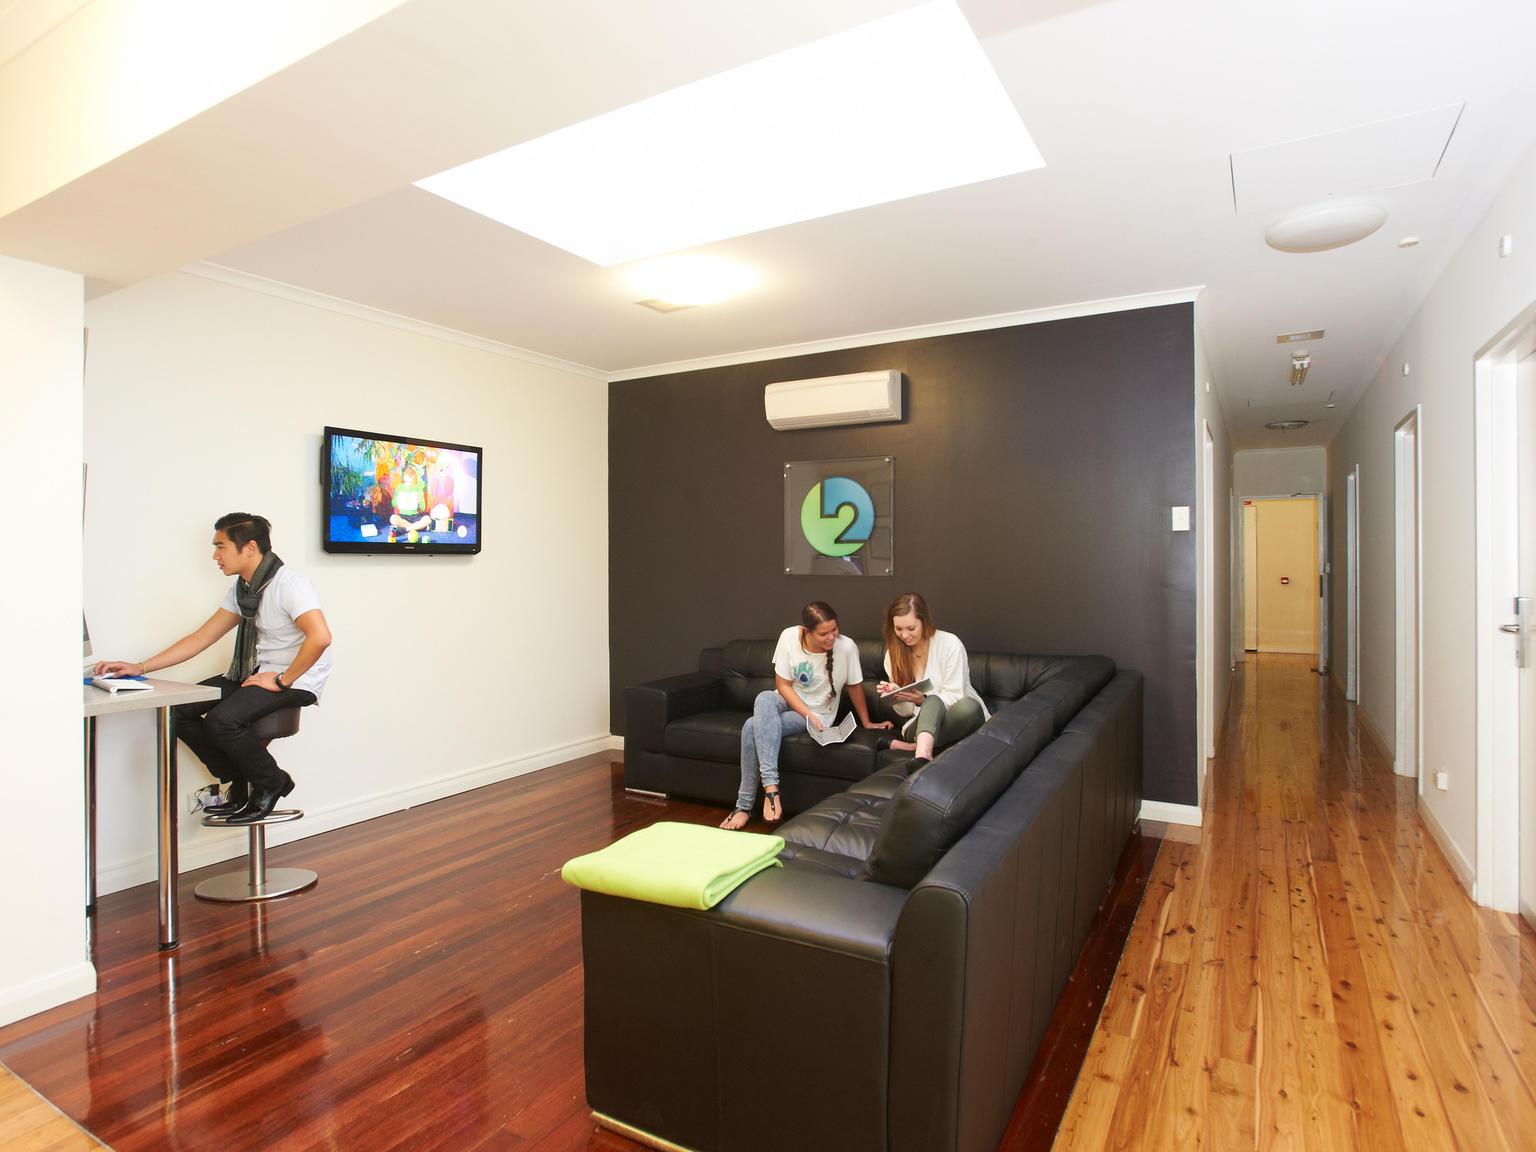 sydney_acc_link2_reisdence_living-room_01_0-1